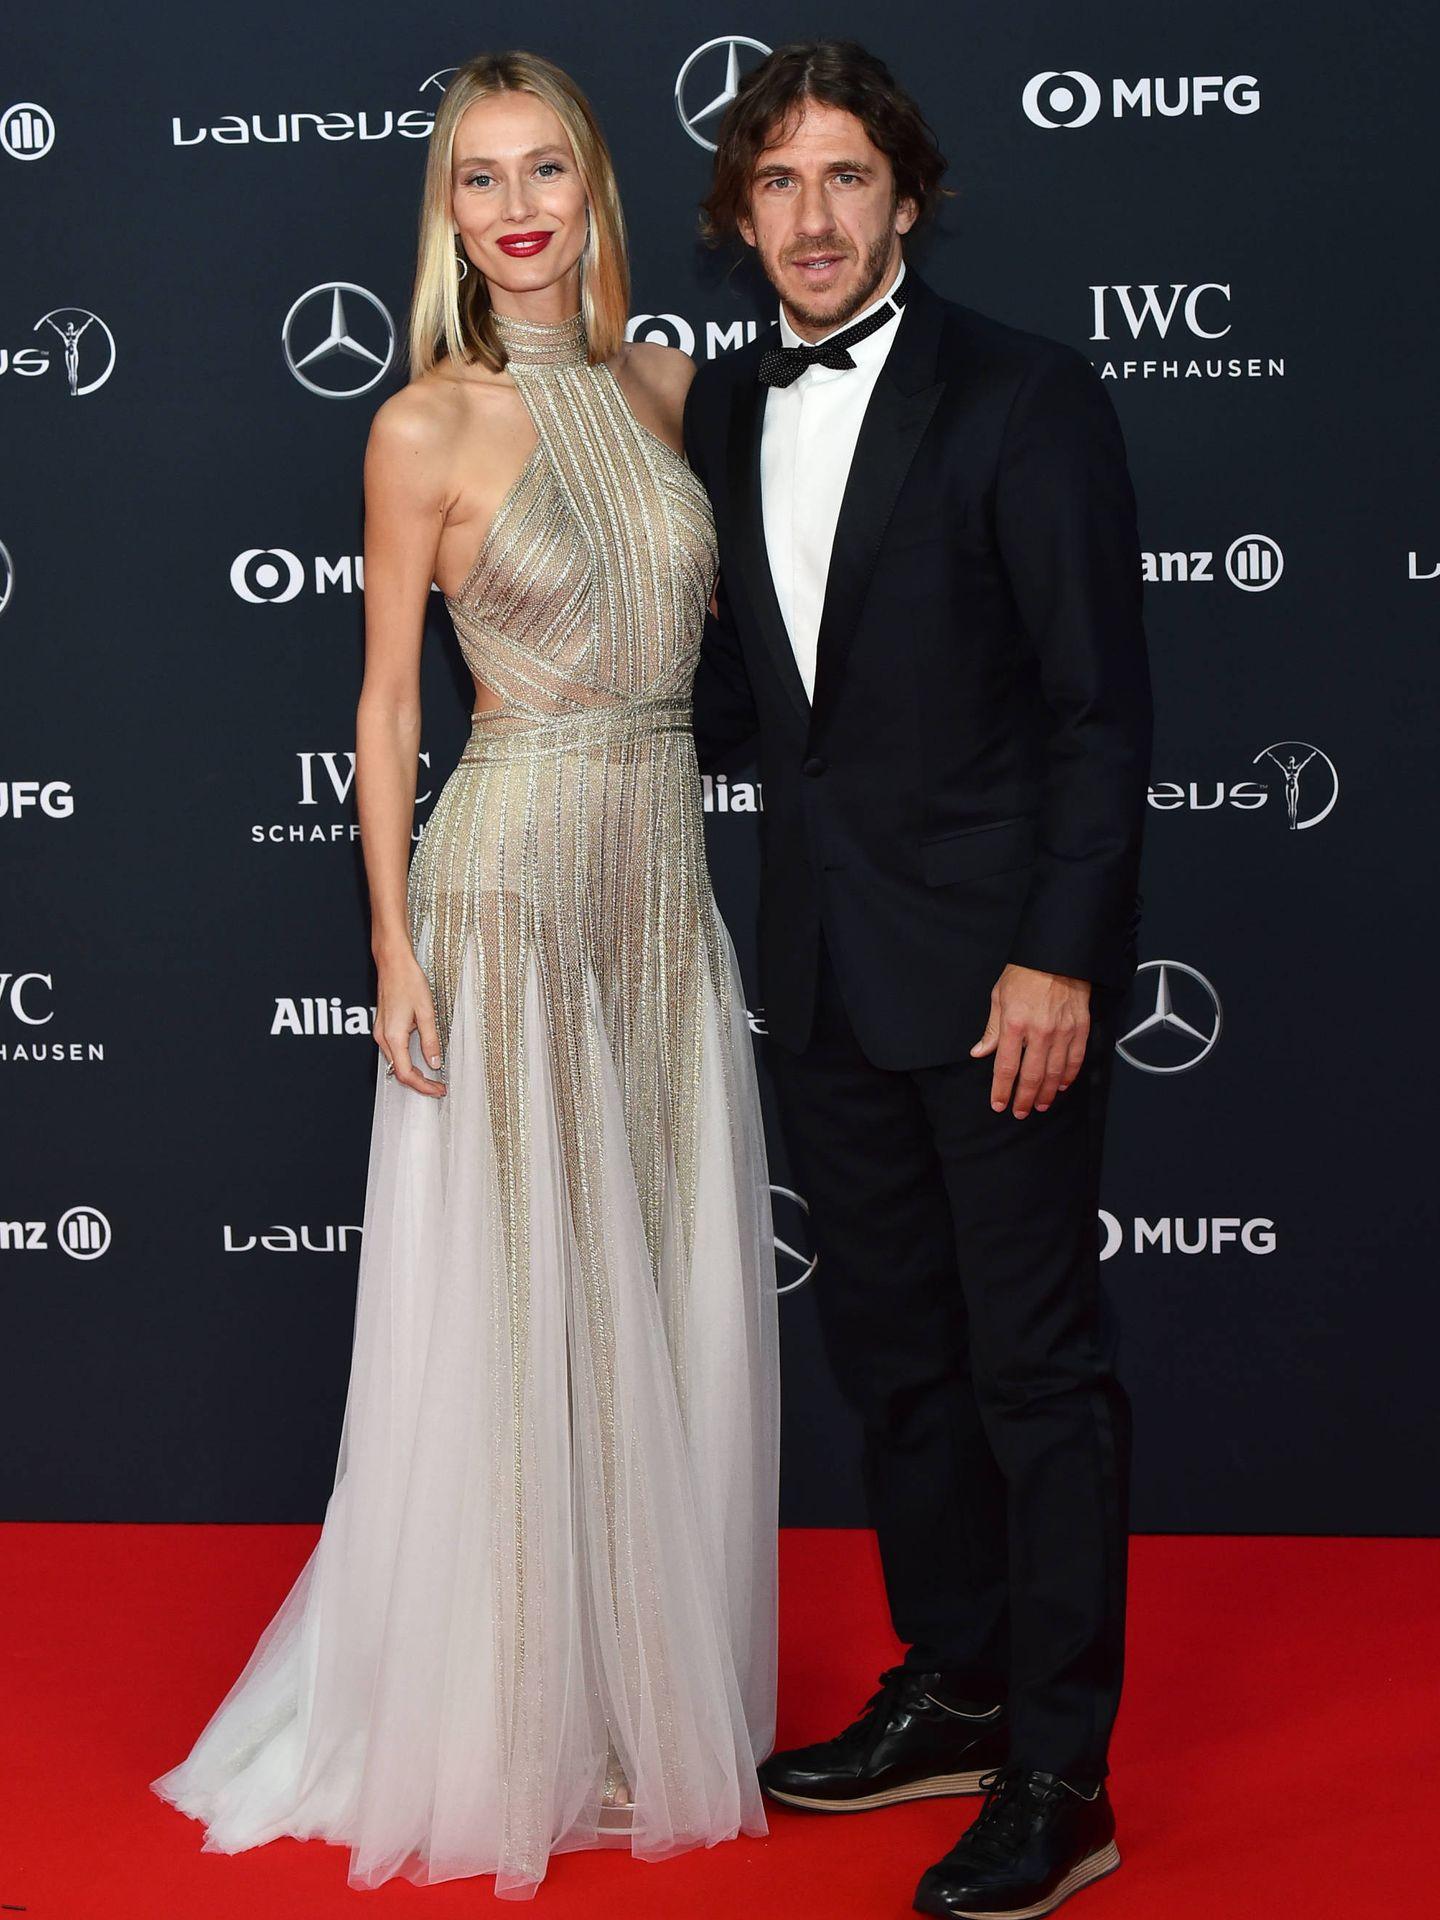 Vanessa Lorenzo y Carles Puyol. (Gtres)